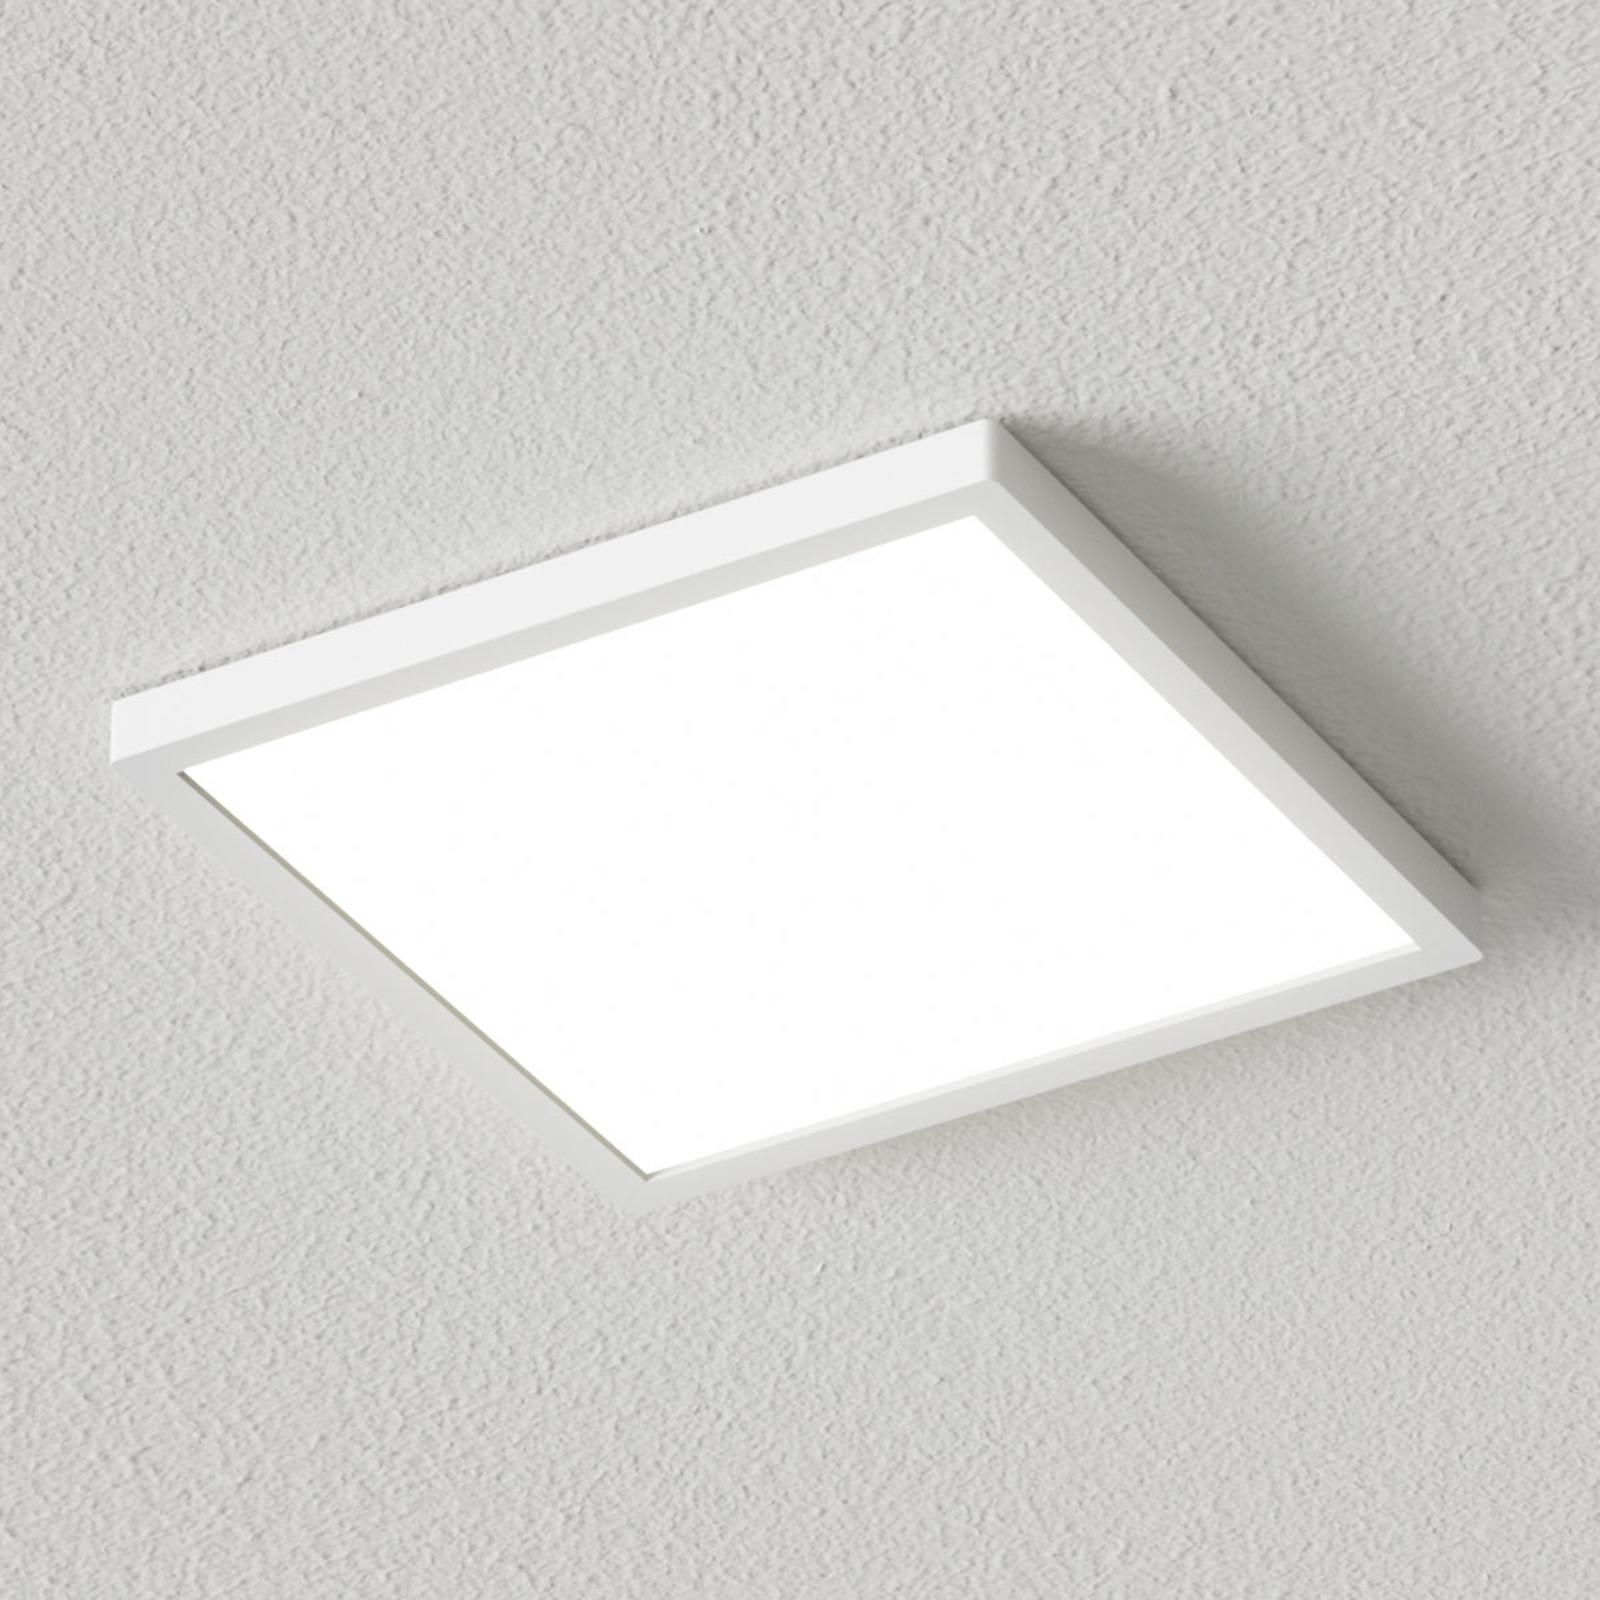 Hvid firkantet LED loftlampe Solvie